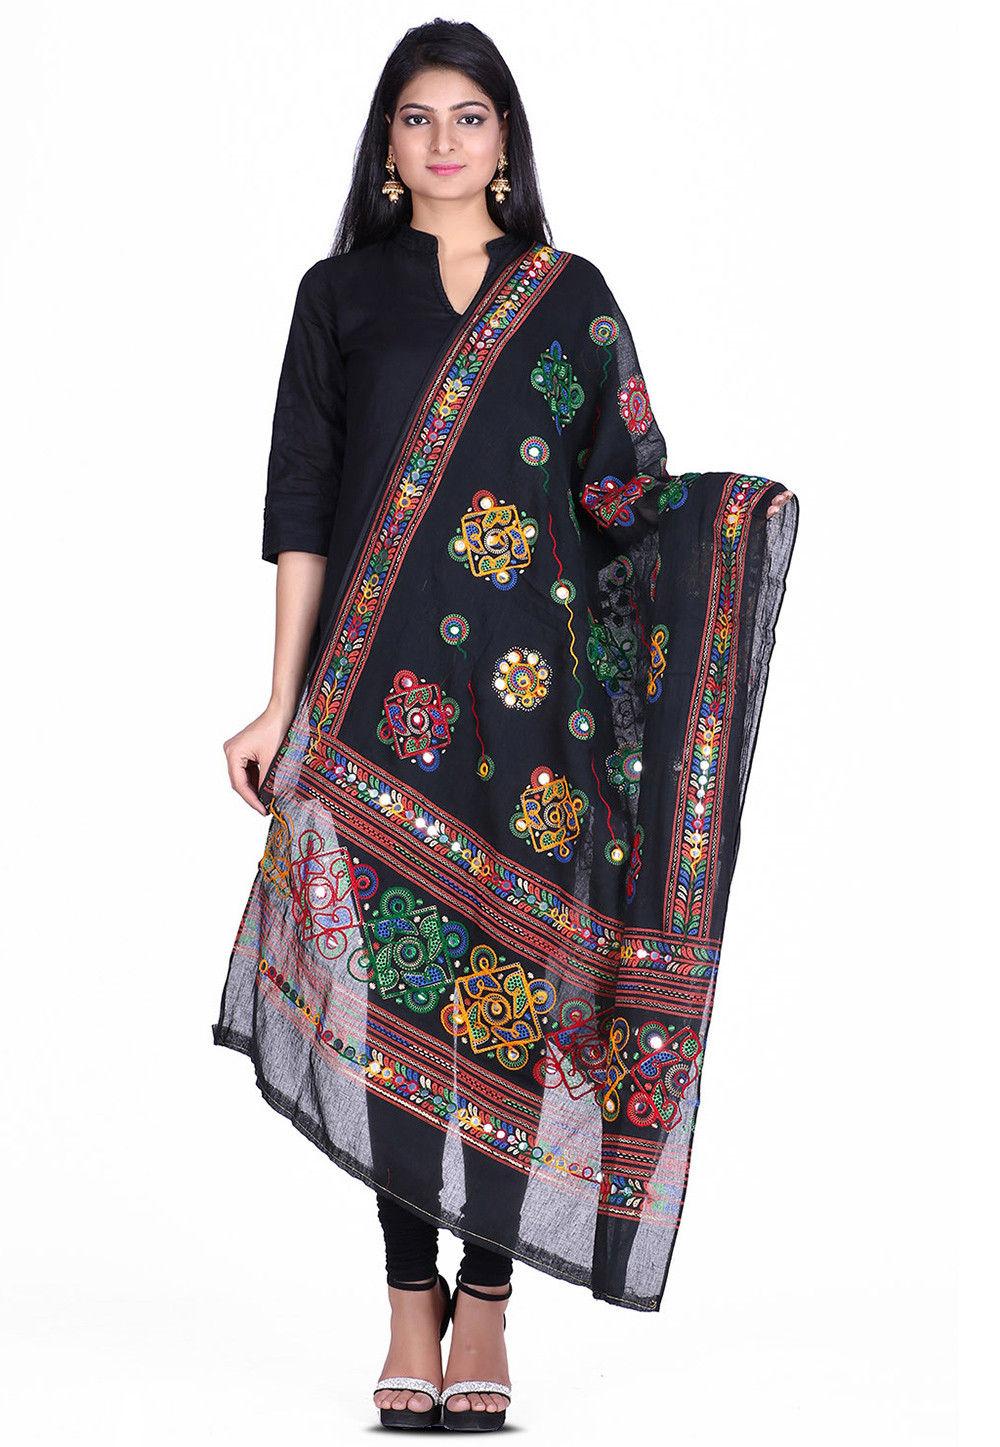 Kantha Embroidered Cotton Dupatta in Black